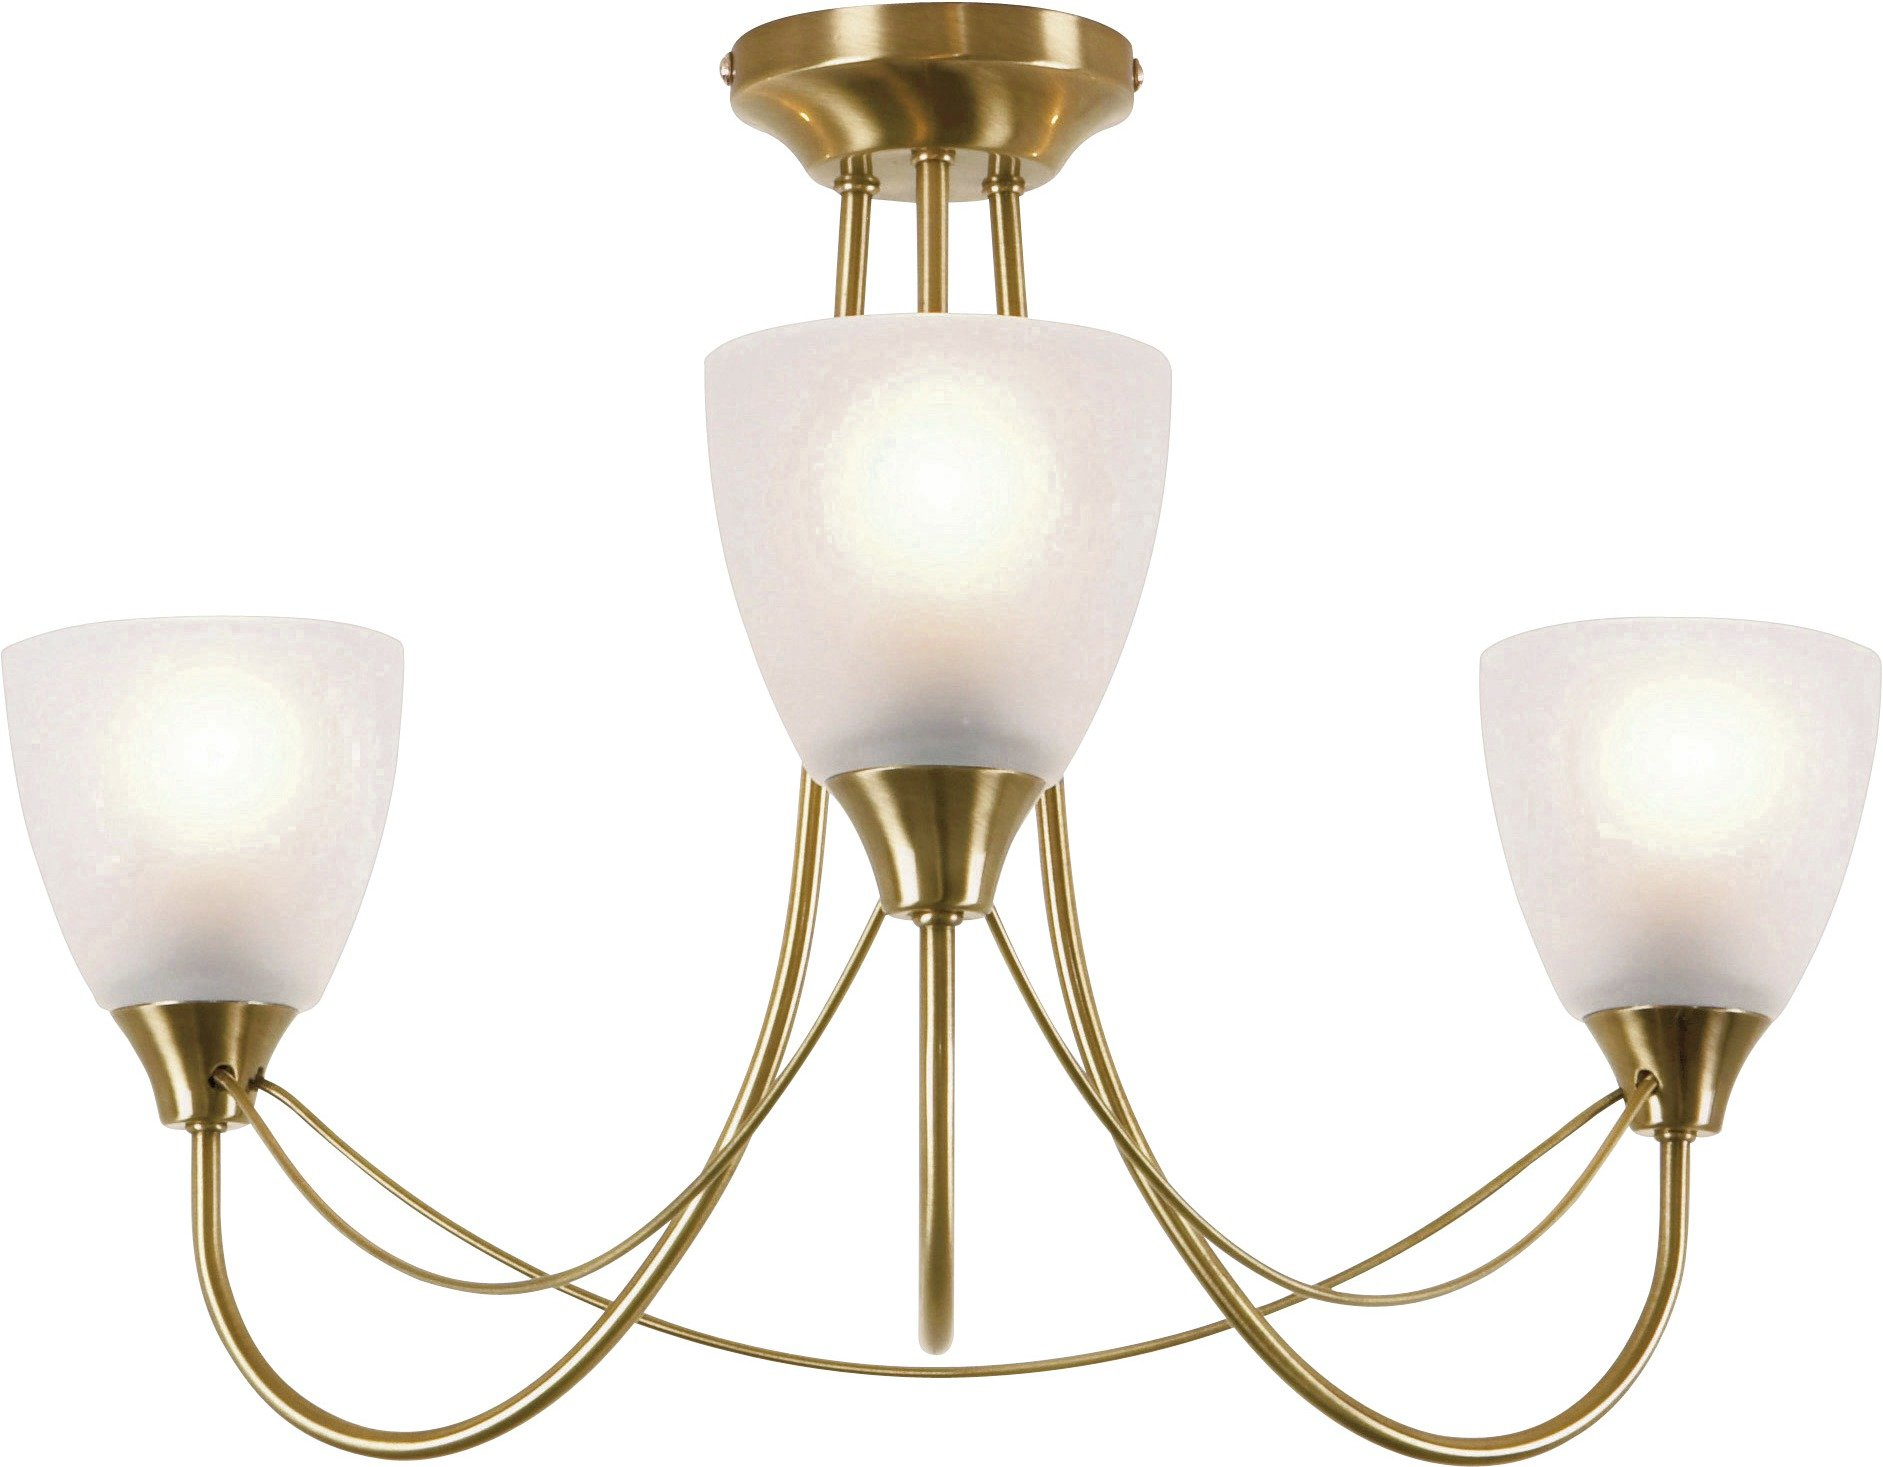 Traditional Bathroom Barclay Flush Fitting Glass Ceiling: Linea Verdace Trio Antique Brass 230 Volt Ceiling Spotlight